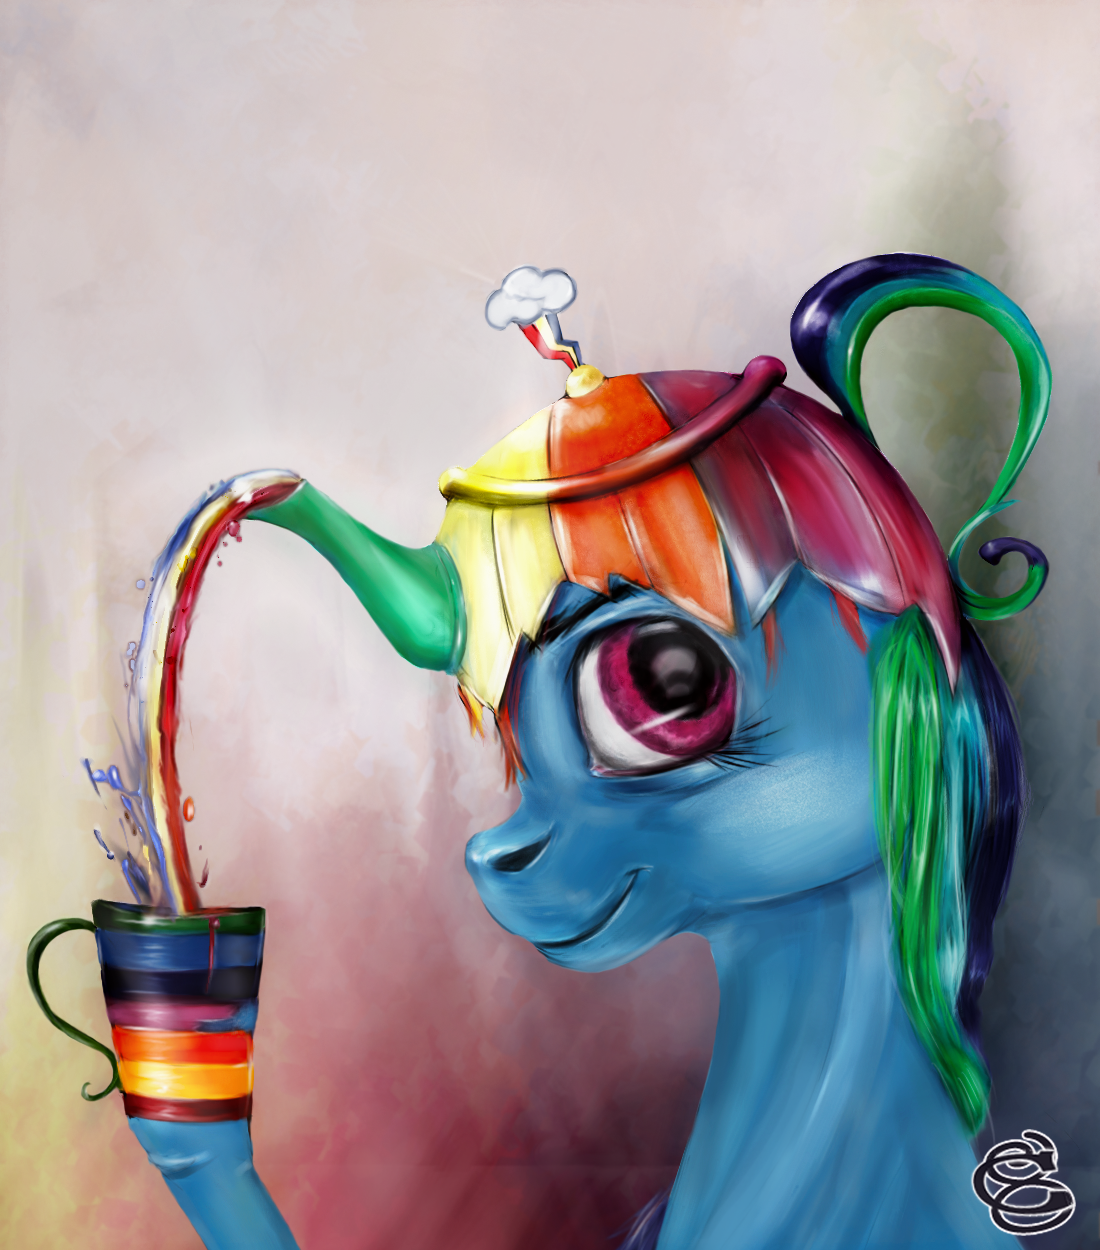 Rainbow teapot by Miradge